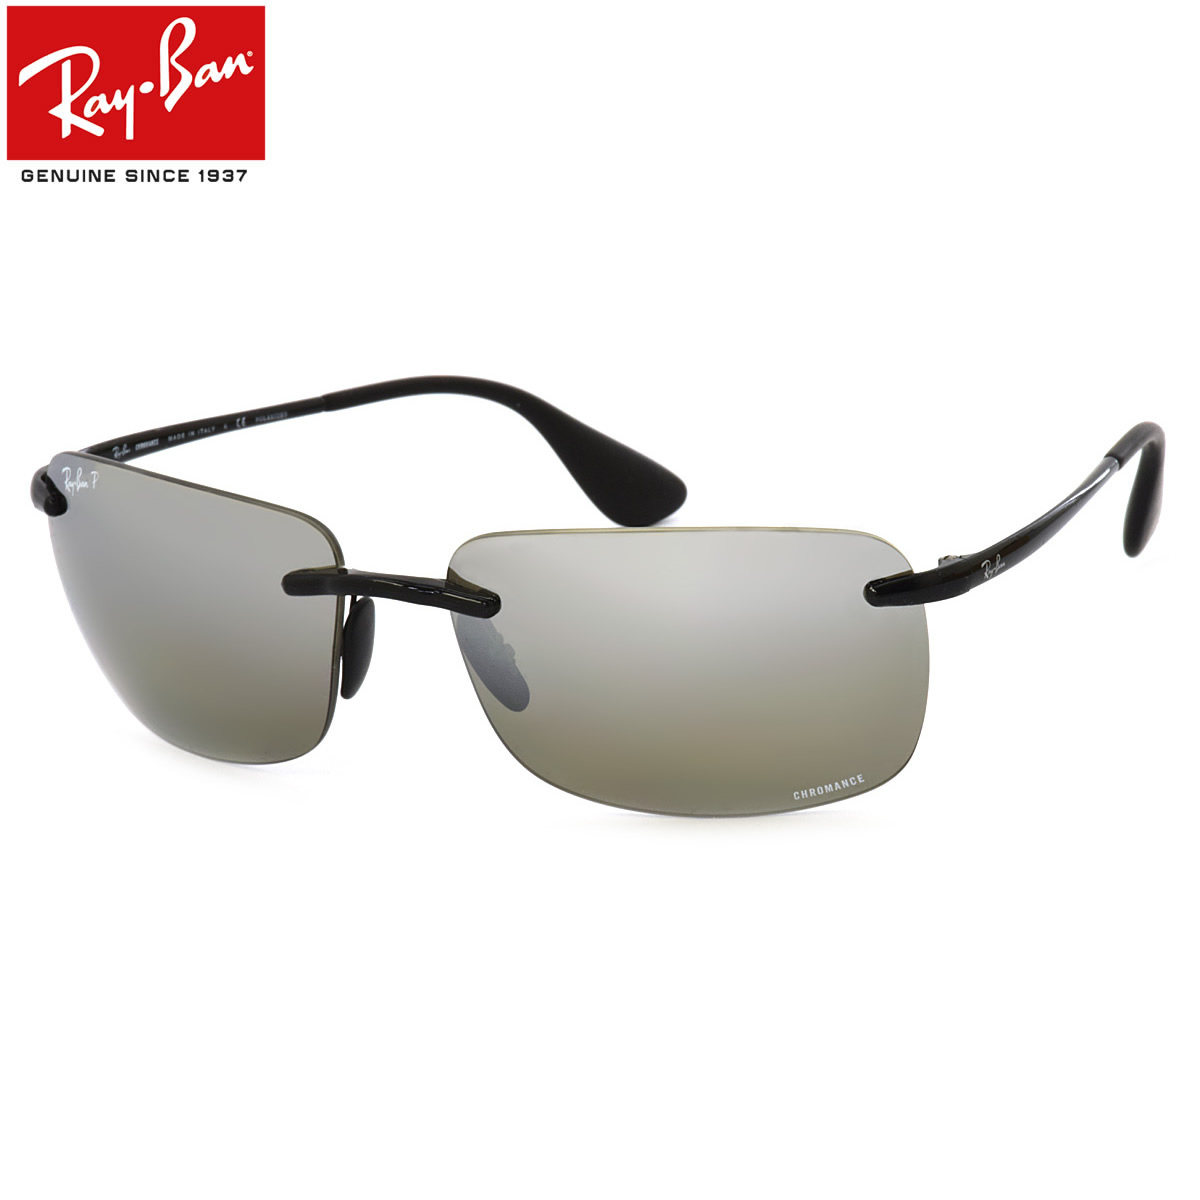 20b0a7715f Optical Shop Thats  Ray-Ban Sunglasses RB4255 601 5J 60size ...